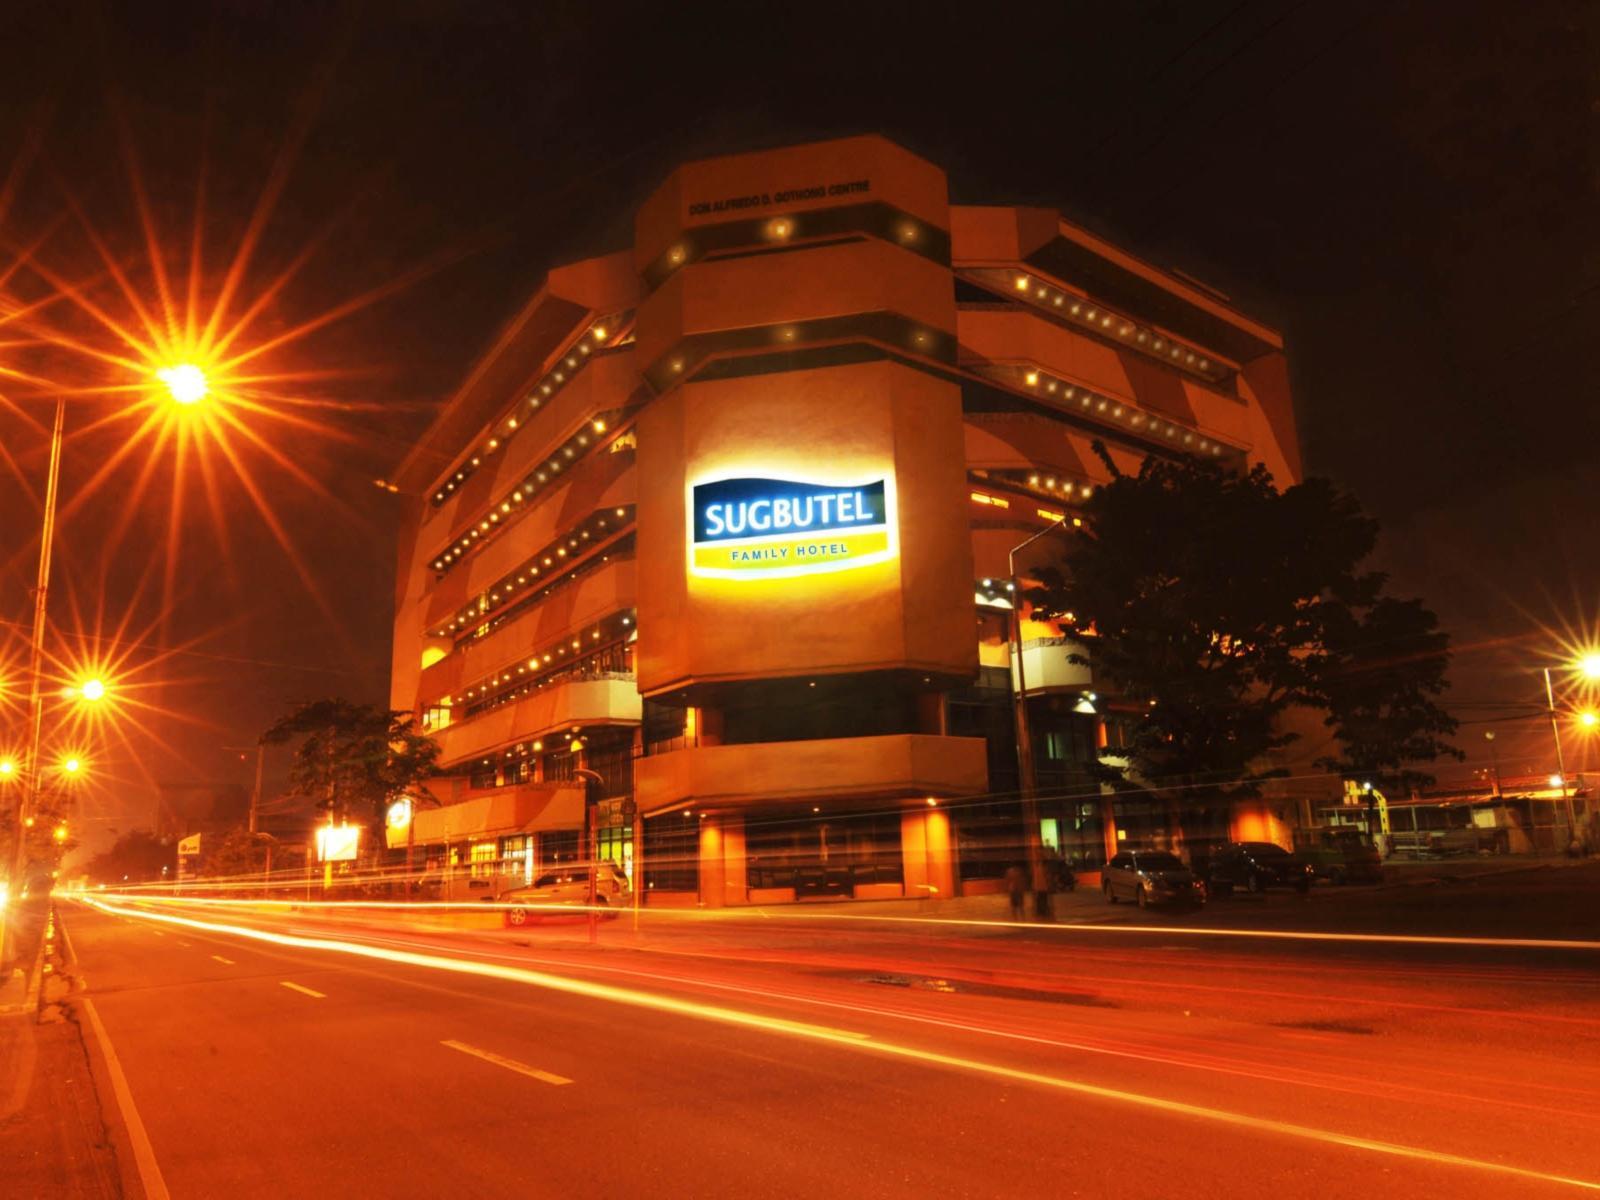 Sugbutel Family Hotel Cebu Philippines Great